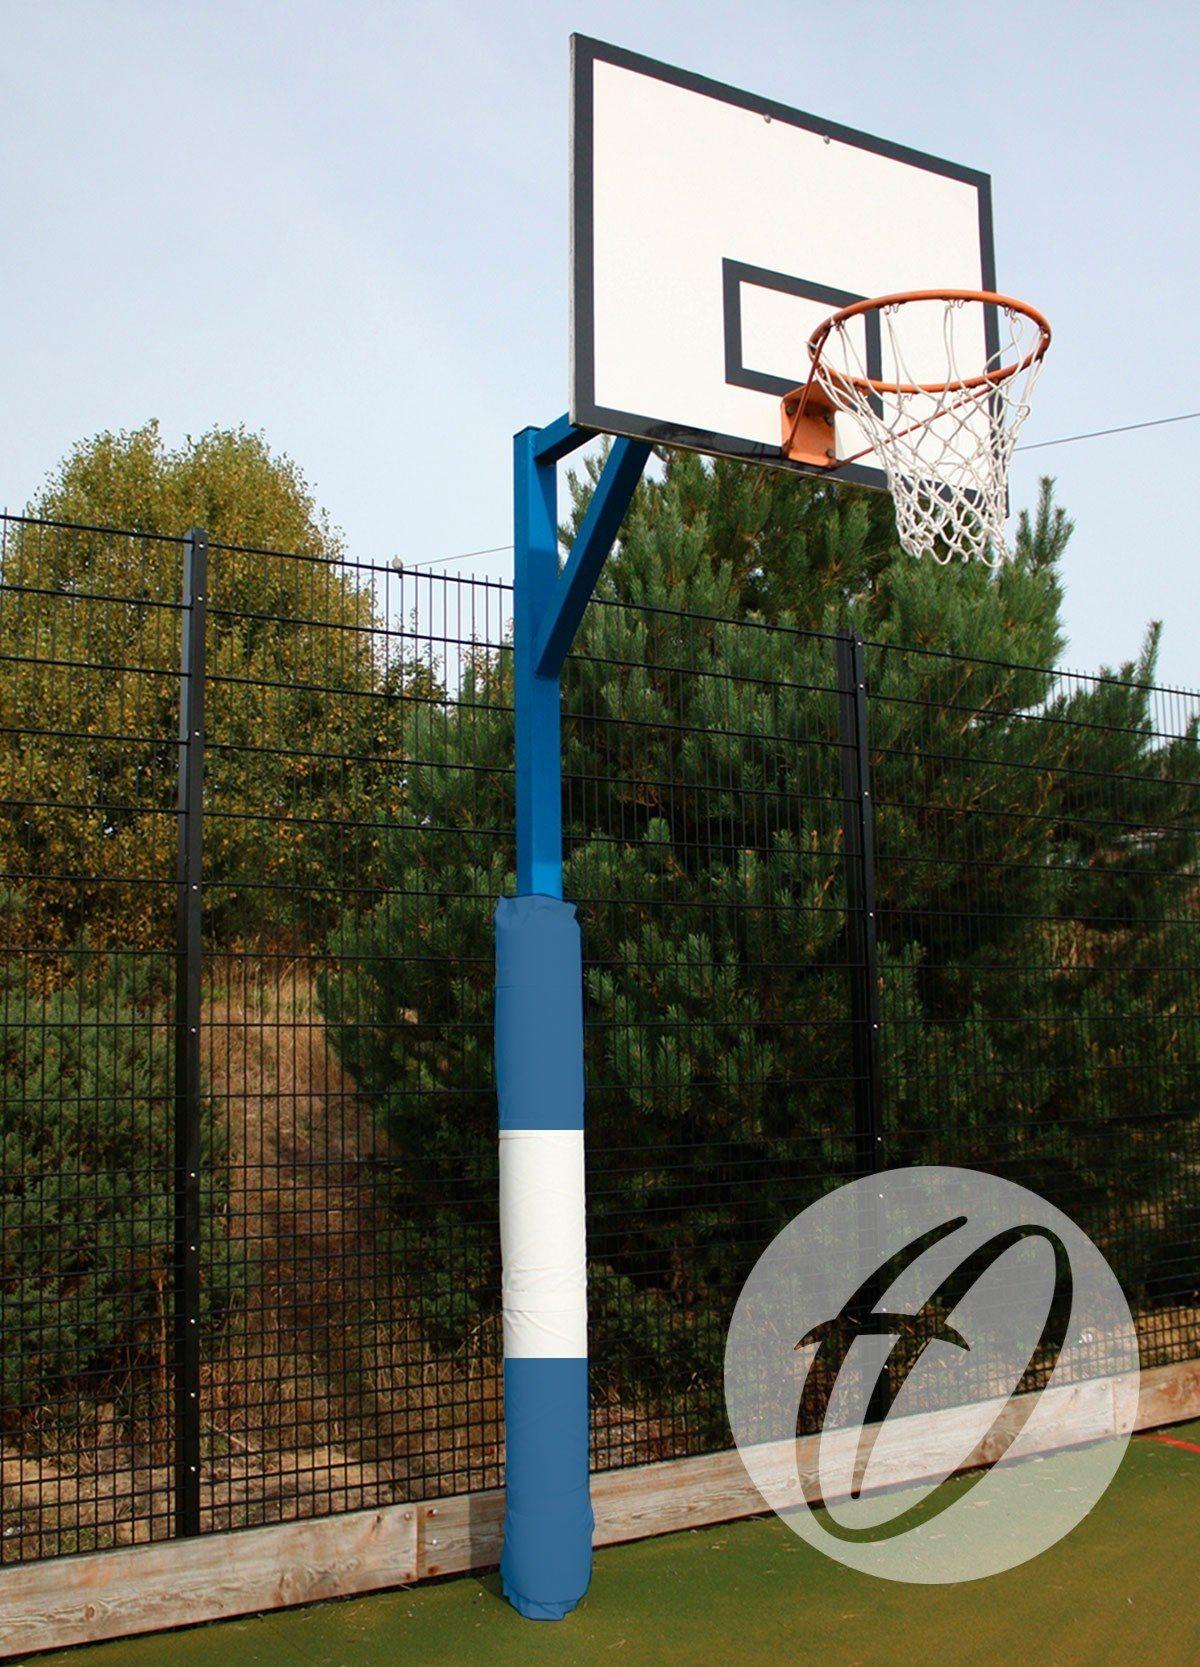 BASKETBALL POST PROTECTORS - MULTI COLOURED